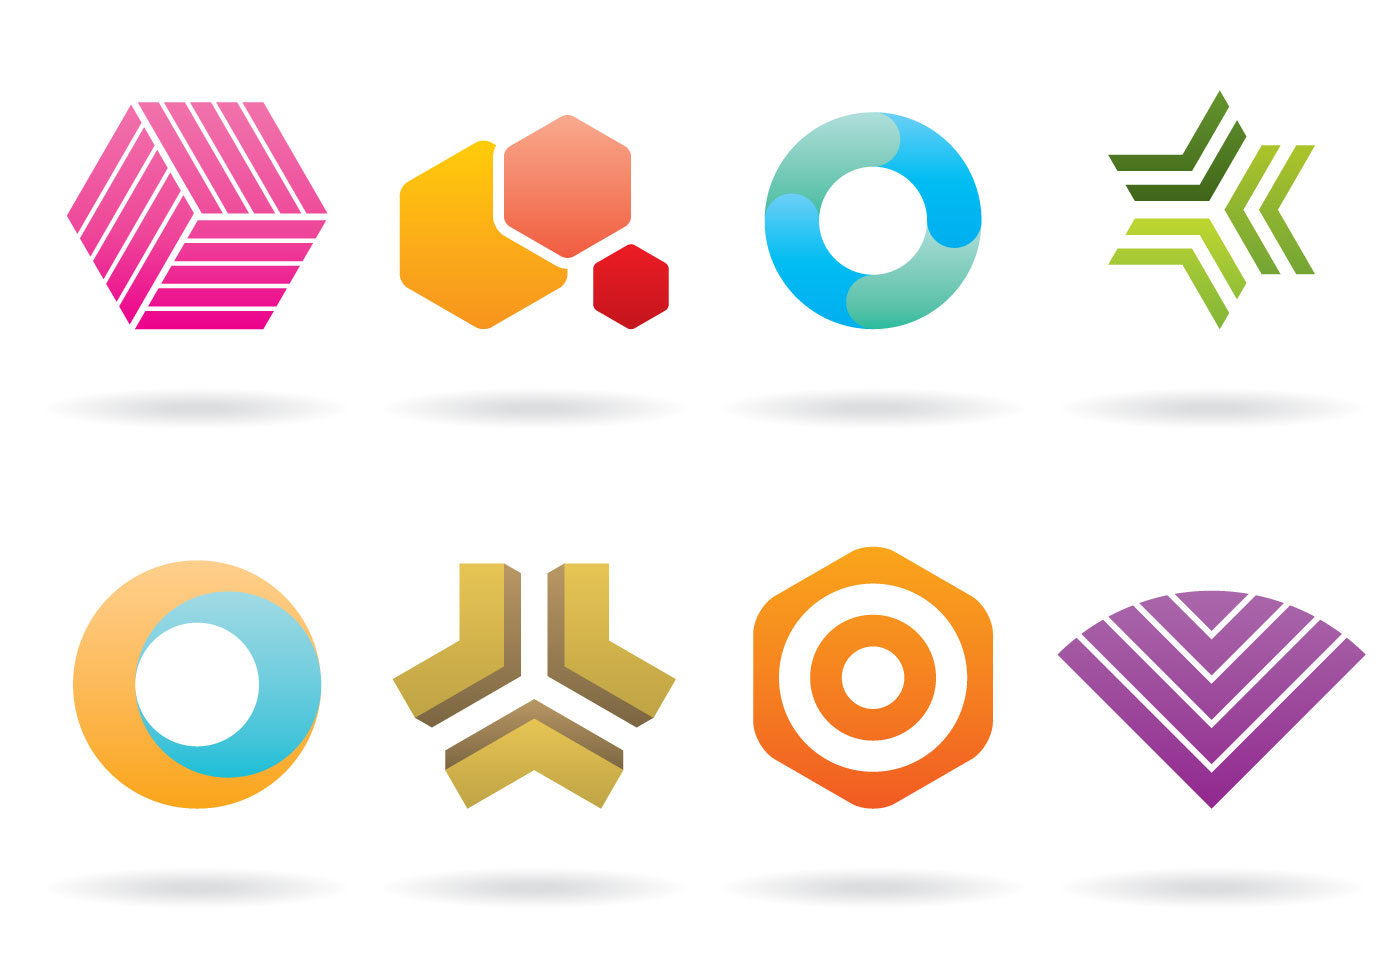 Logo Free Vector Art - (47392 Free Downloads)